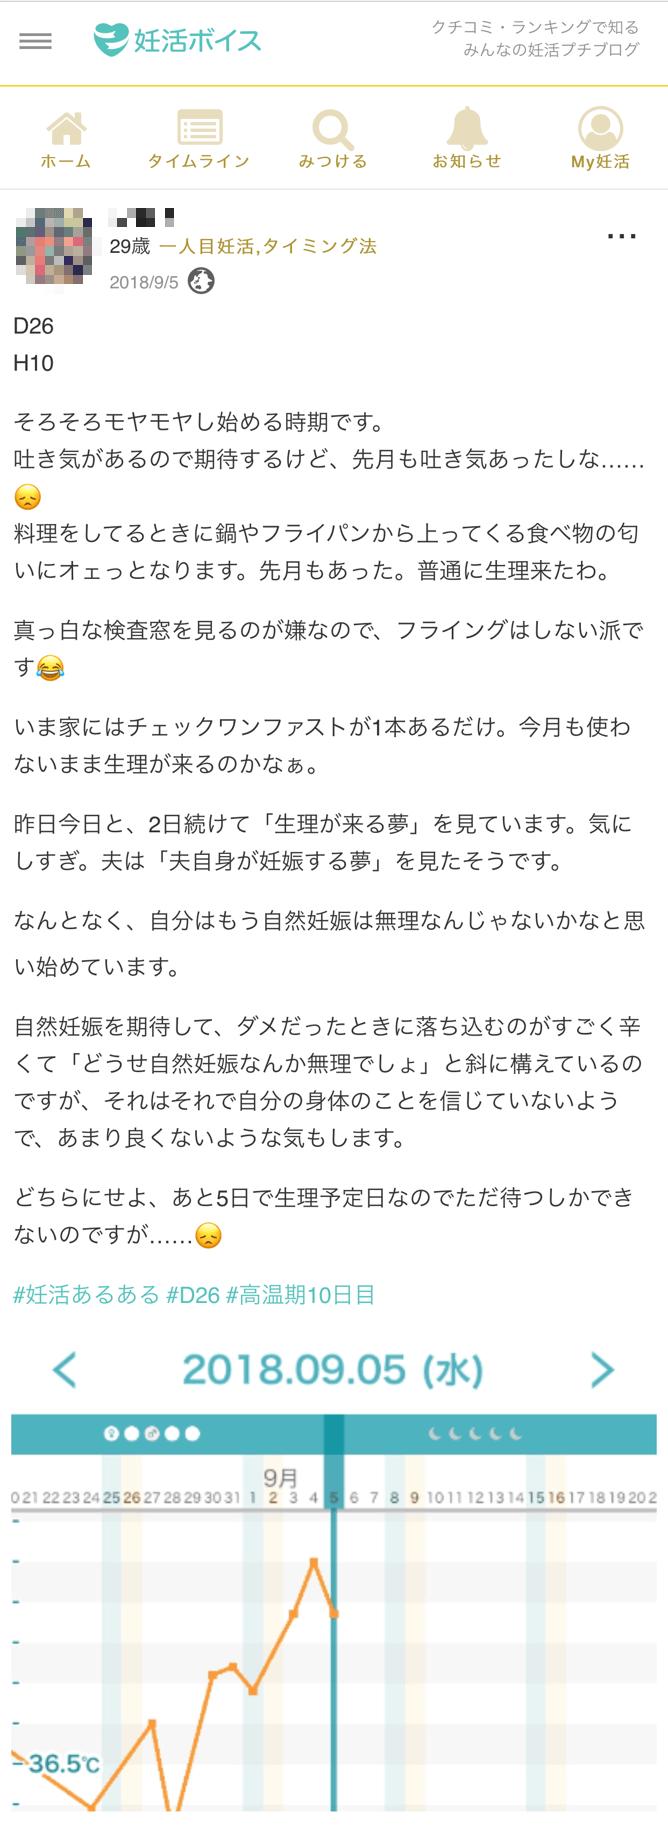 Yさん(29歳・1人目妊活・タイミング法)